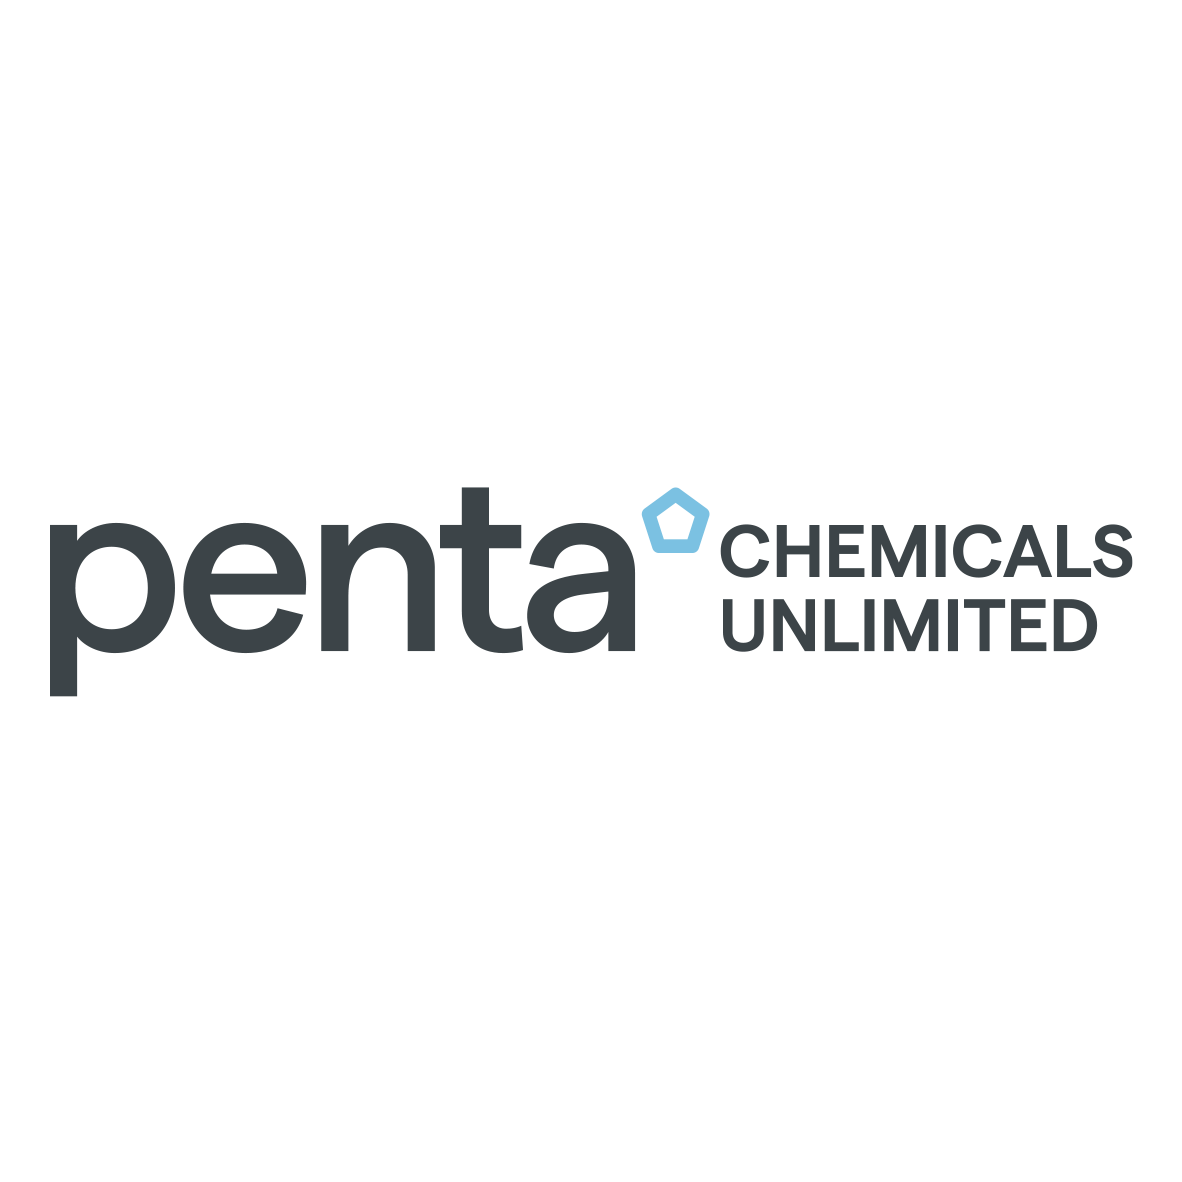 Logo des neoFroxx Partners Penta